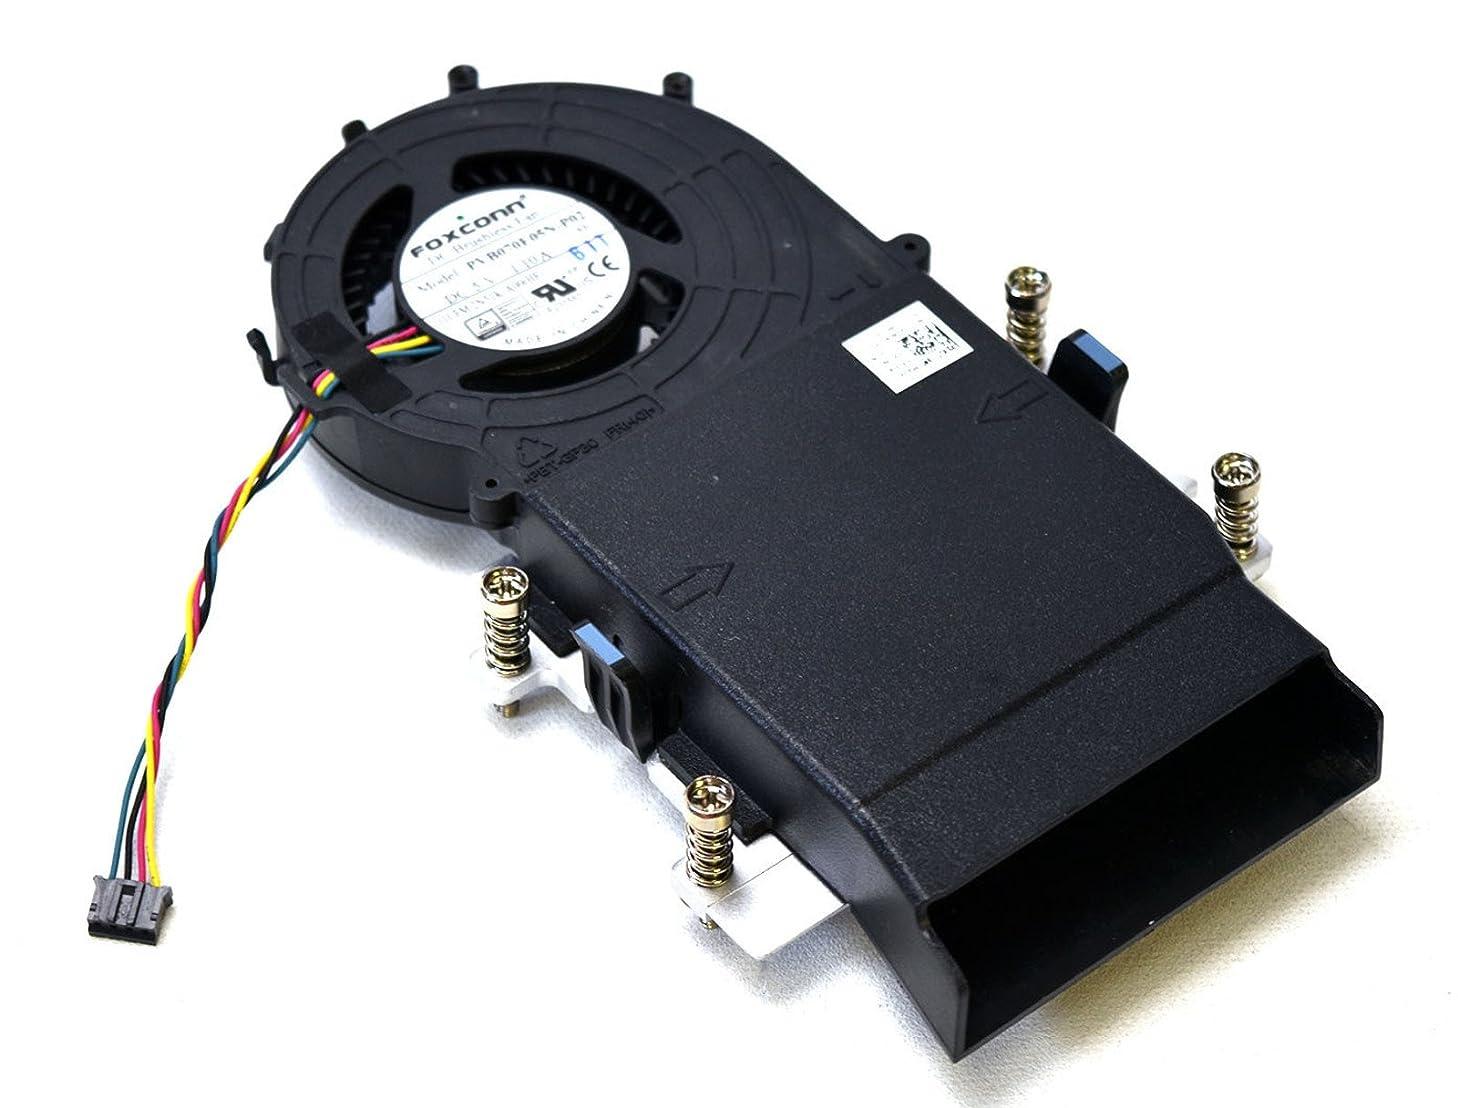 Aquamoon Trading New 5JV3N Dell Optiplex 3020M 9020M 7040M 7050M Desktop Fan Assembly with 2N51K Cooling Blower Fan CPU Shrouded Heatsink Captive Thumbscrews Base Plate